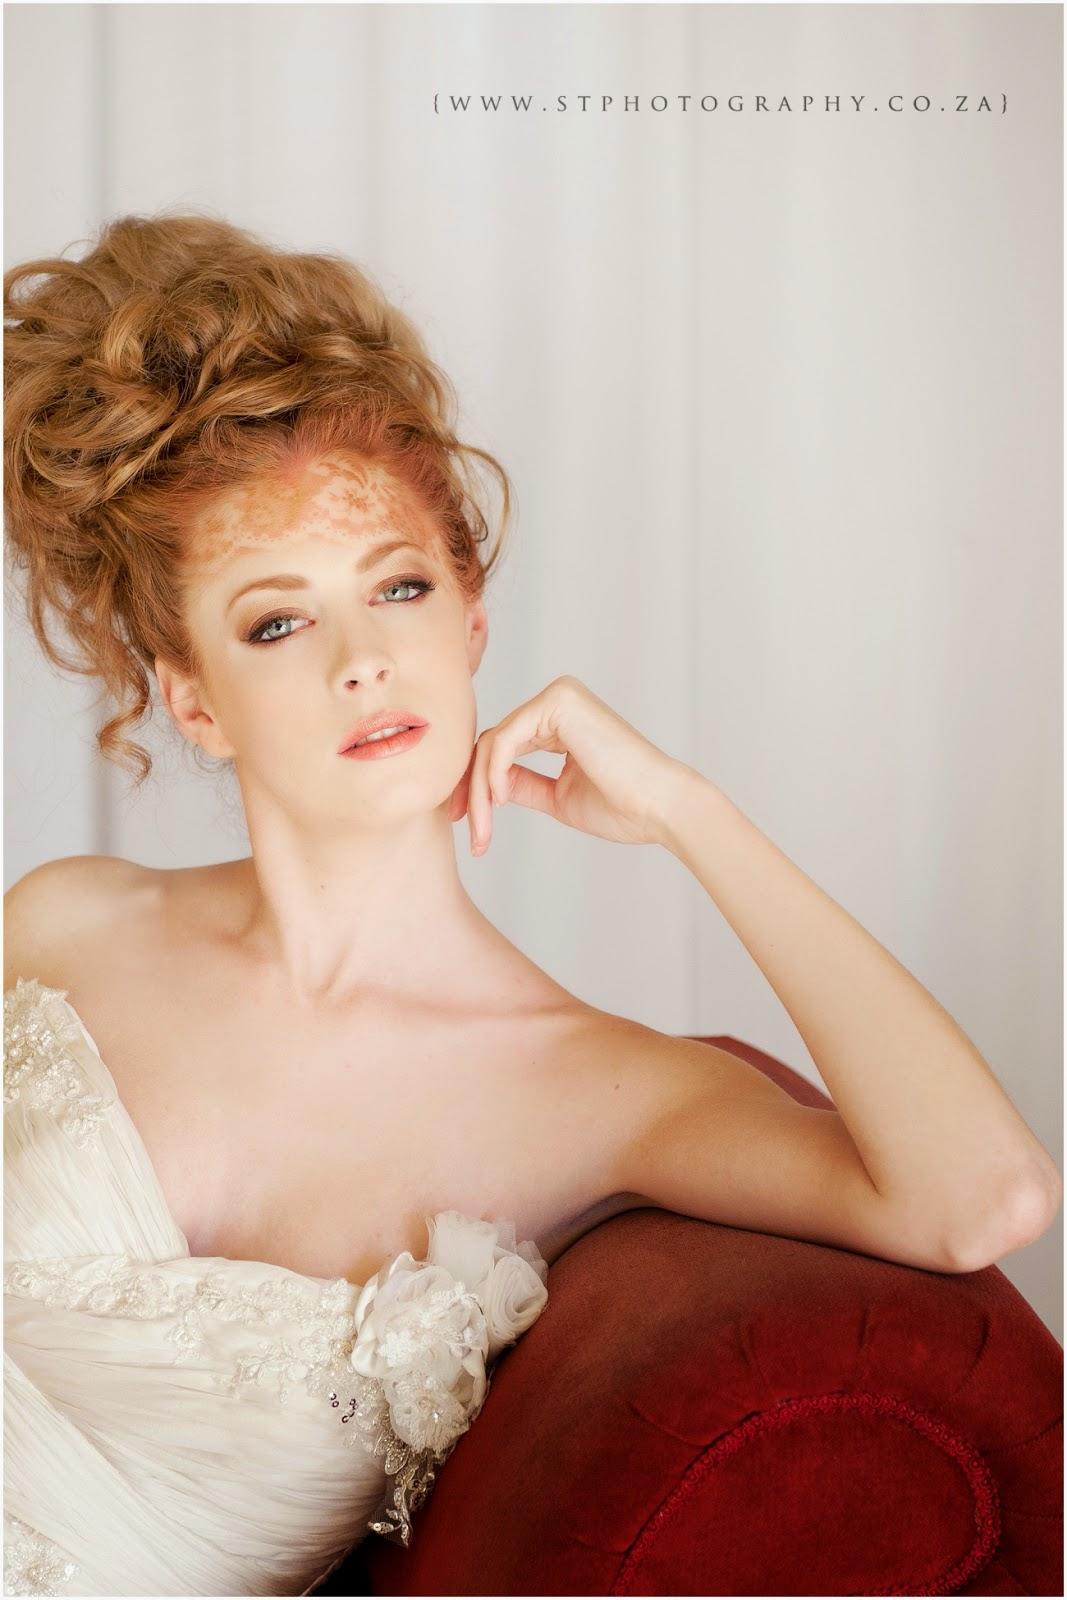 adri hugo- hair and make-up artist